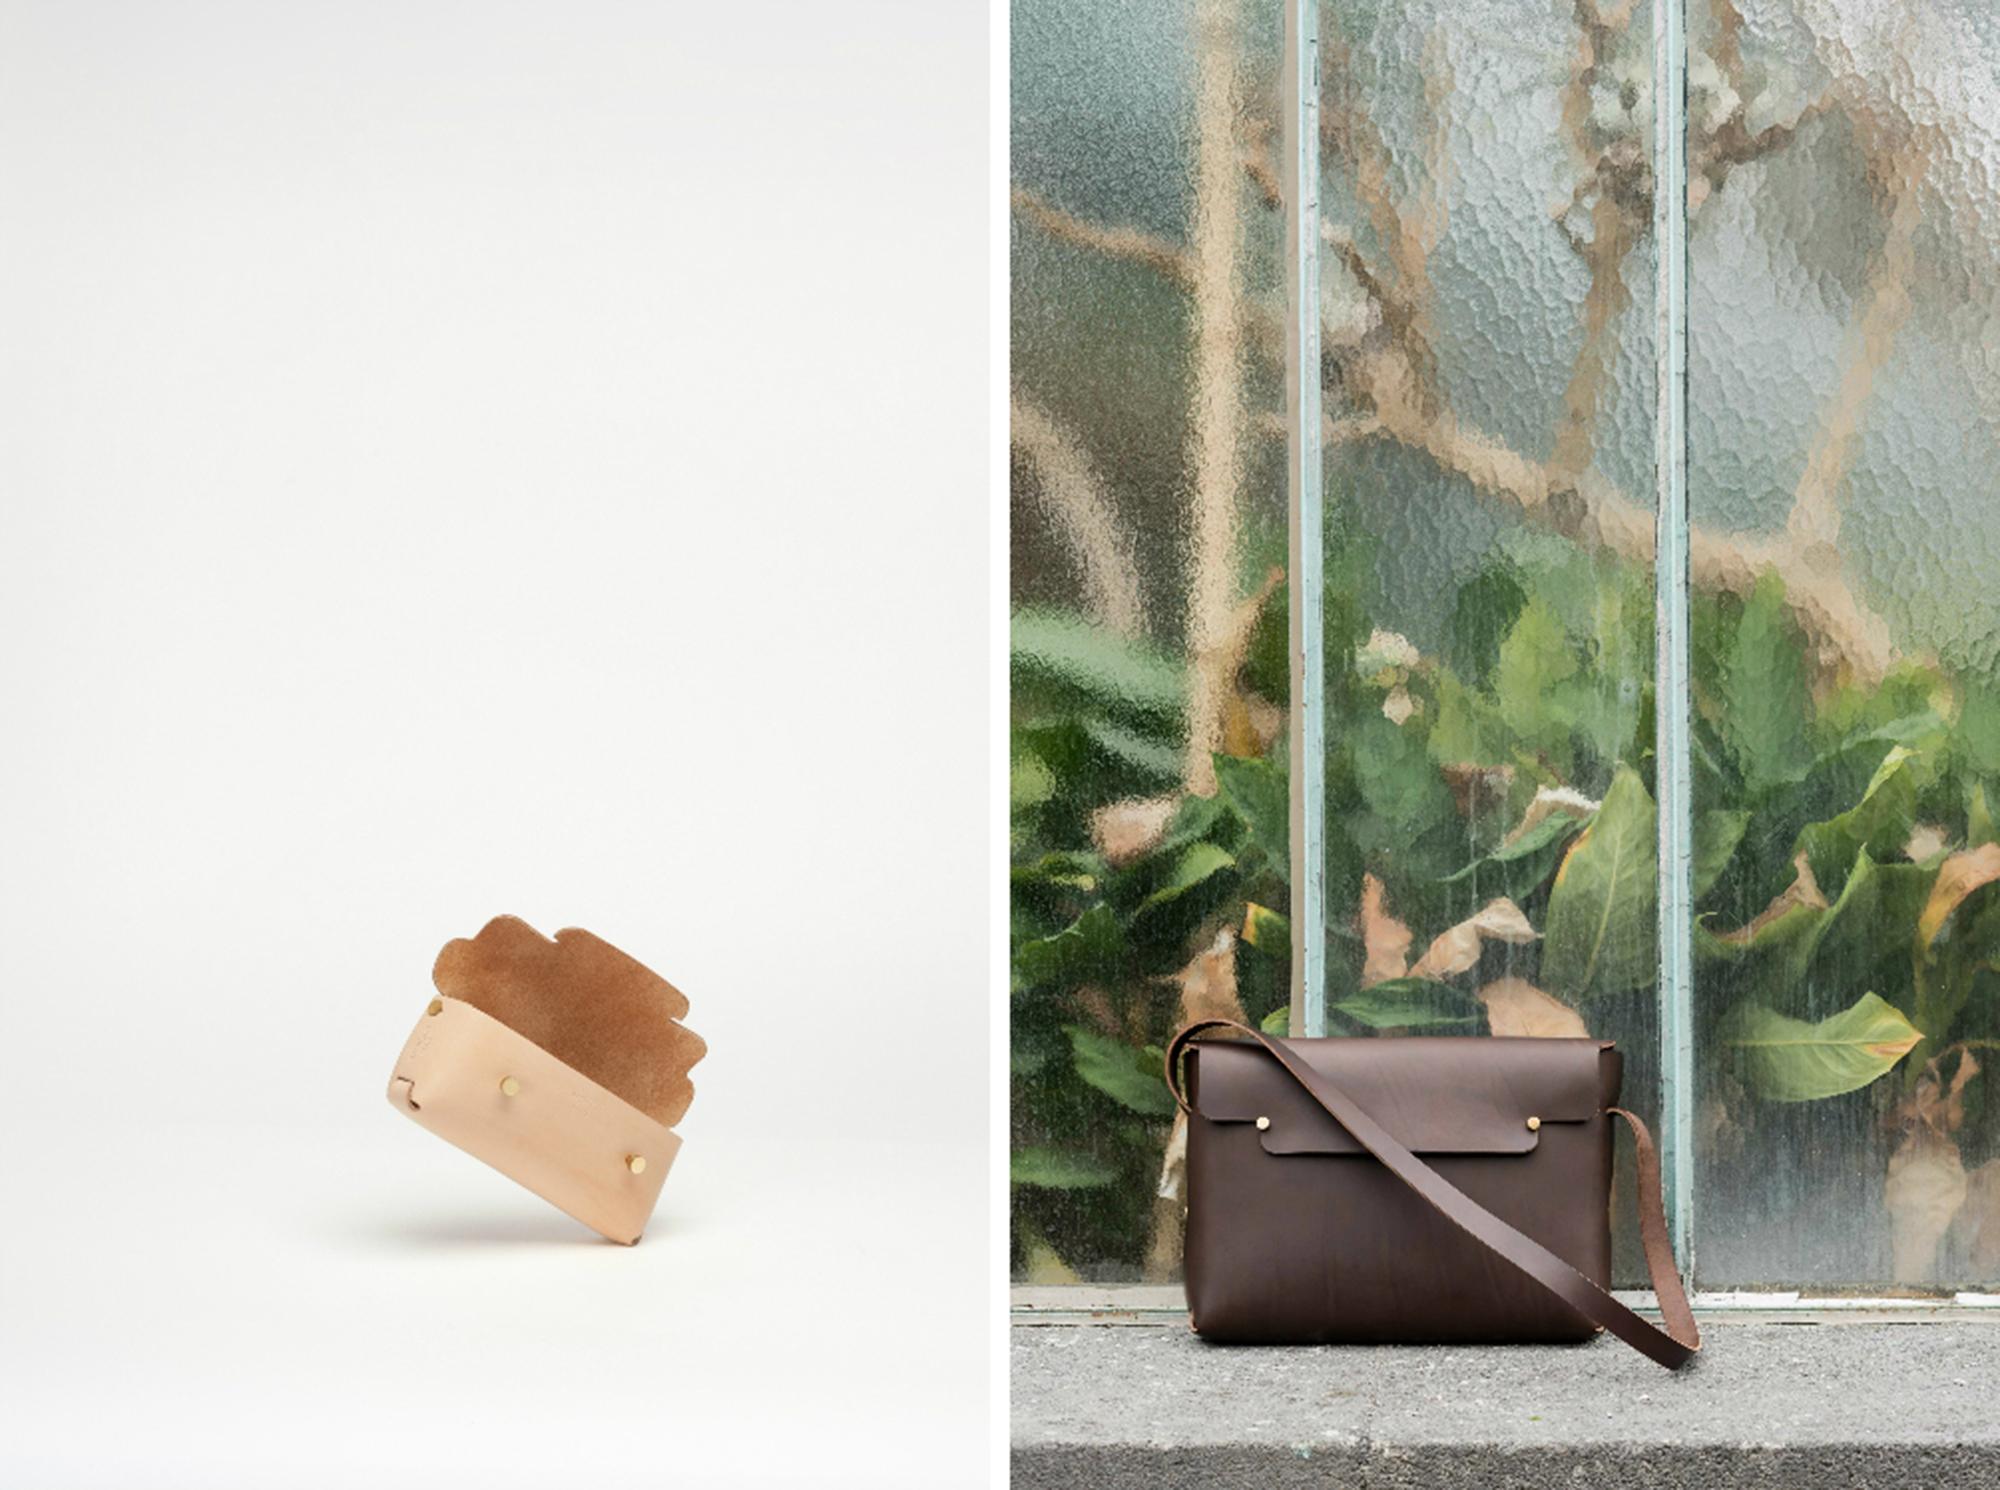 Archipel Paris; Handmade leather bags by Sebastien Cordoleani